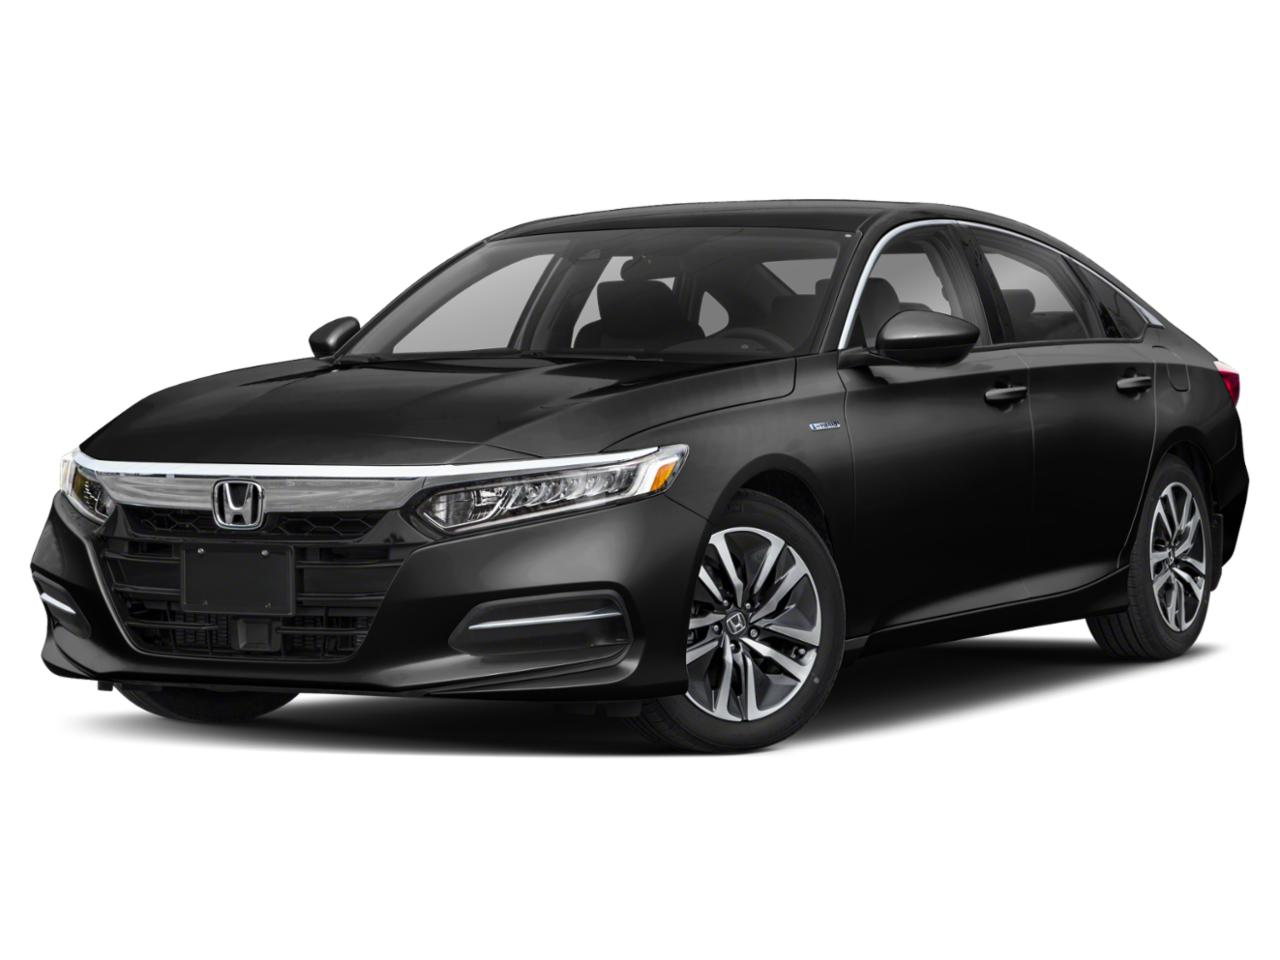 2019 Honda Accord Hybrid Vehicle Photo in Bethlehem, PA 18017